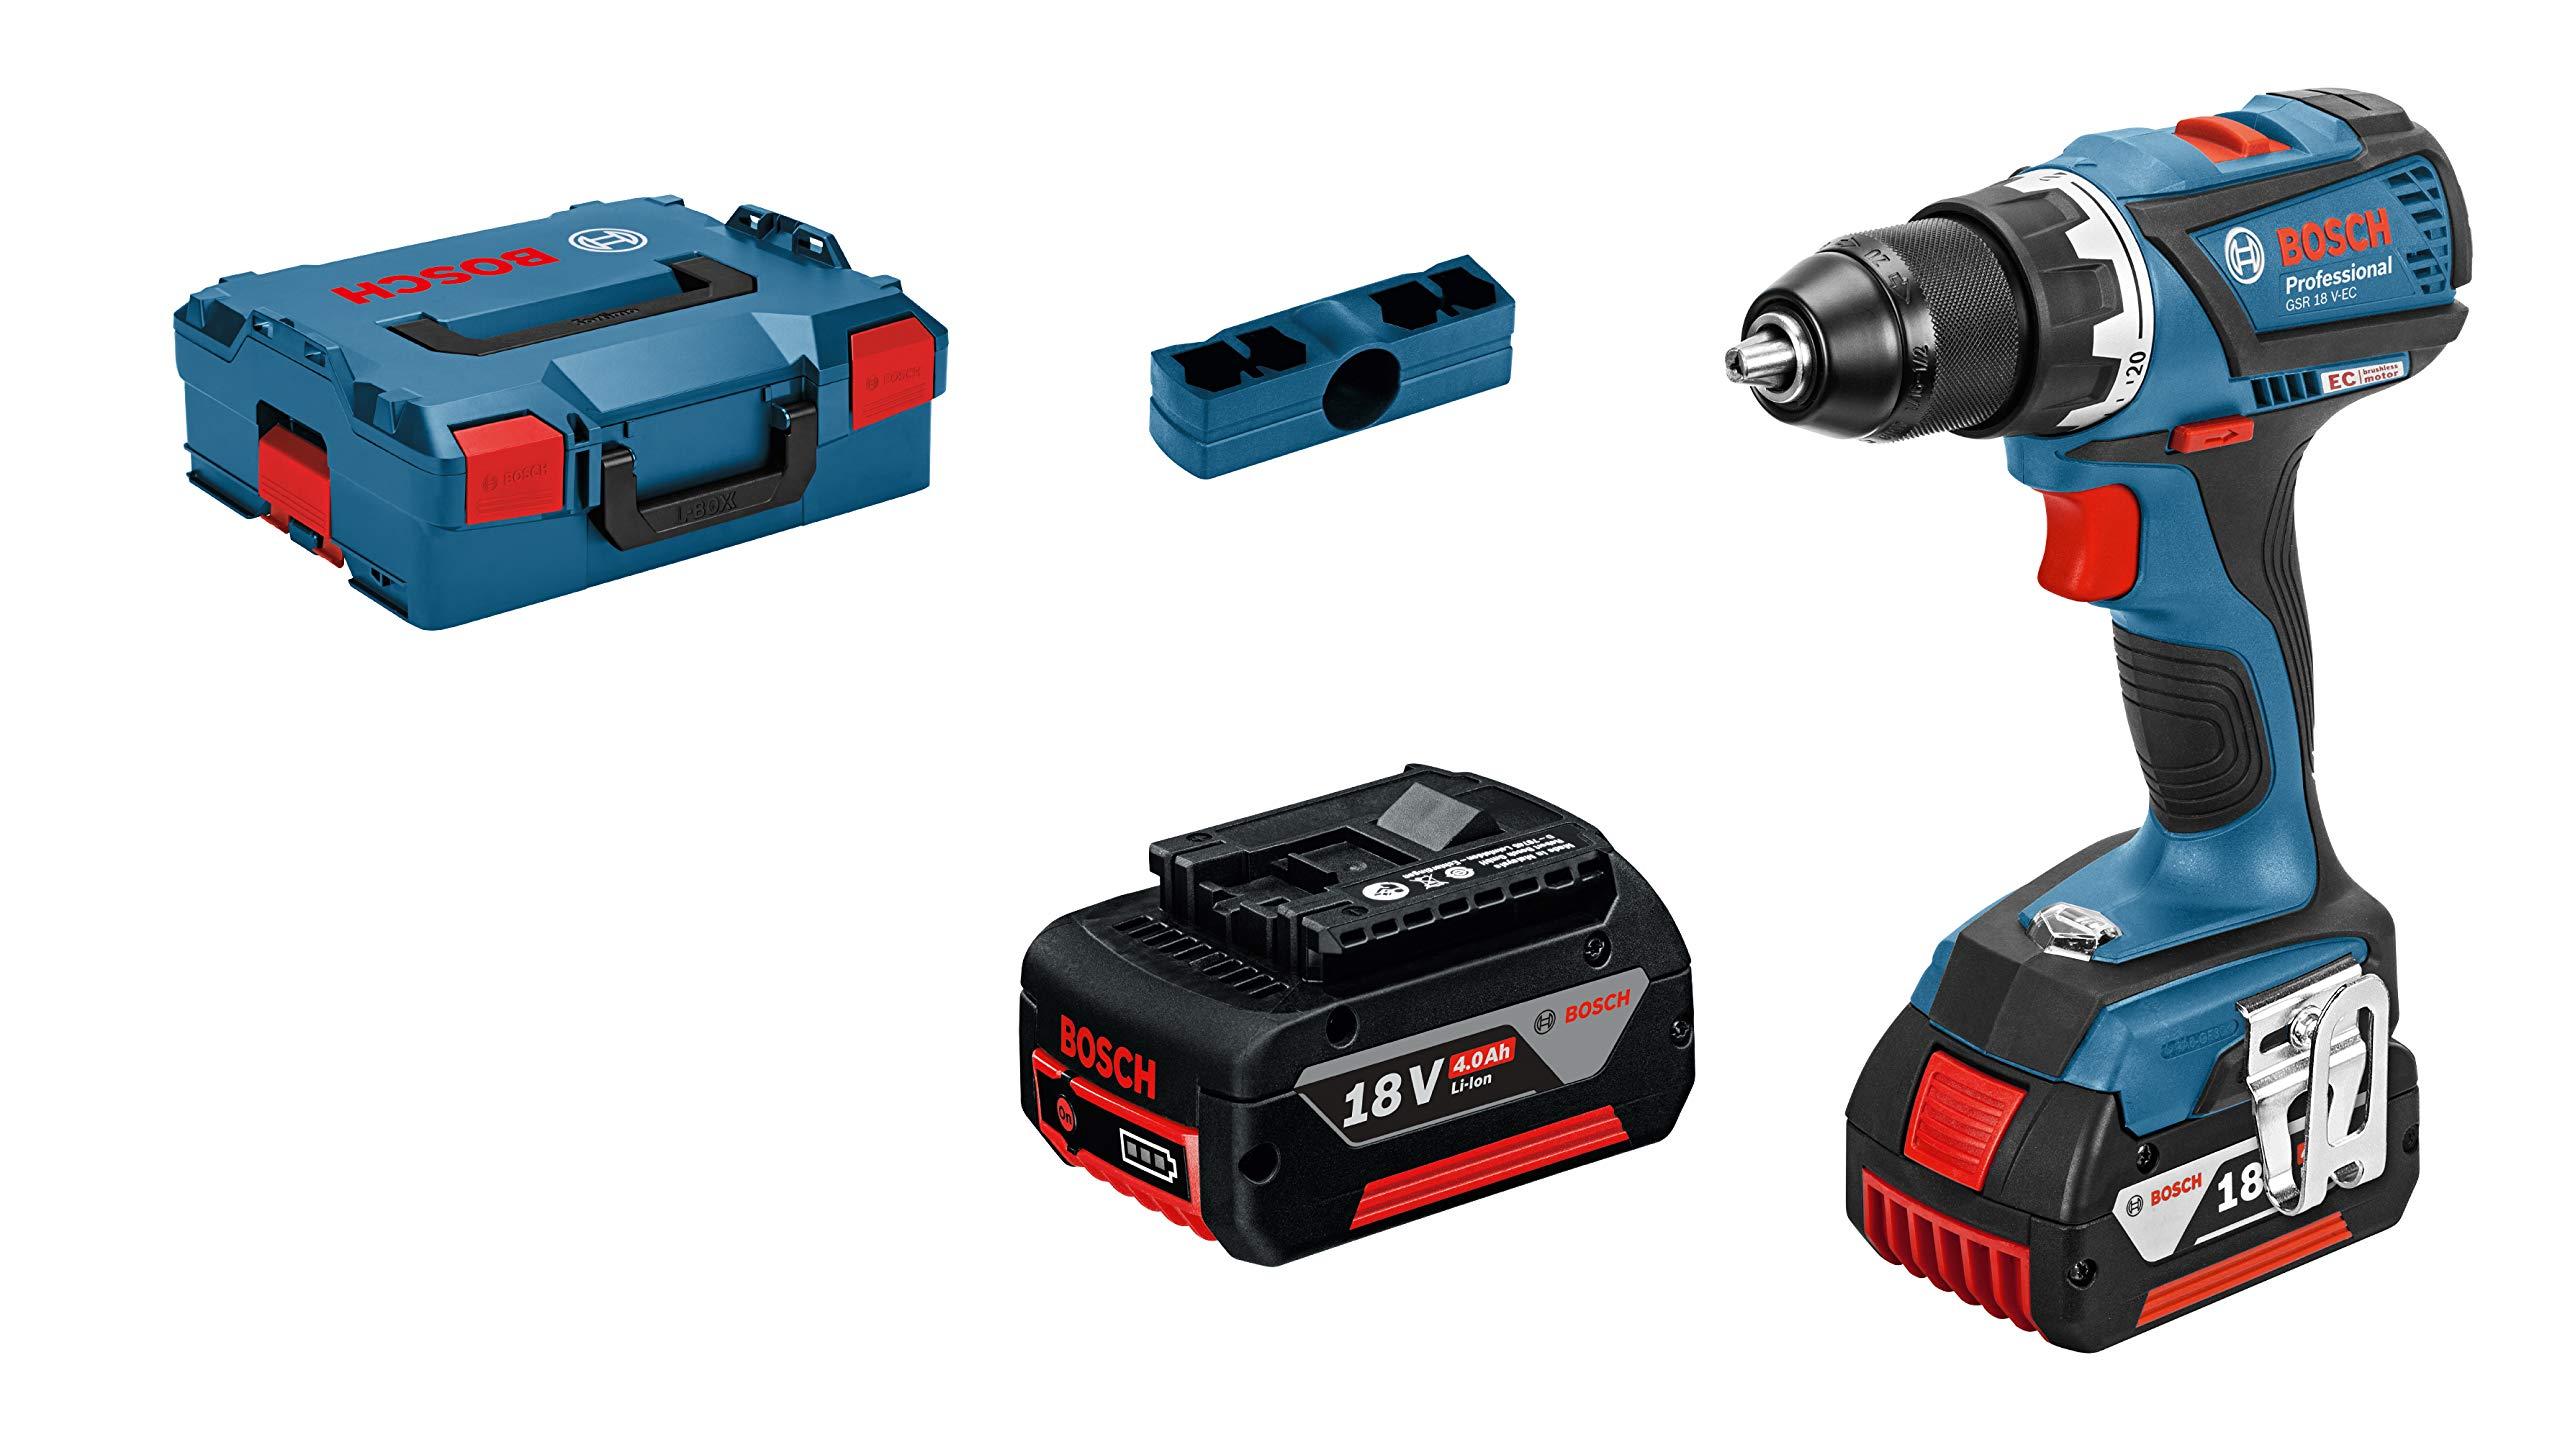 L-Boxx GDR 18-LI Cordless Impact Driver with Two 18 V 2.0 Ah Lithium-Ion Batteries Bosch Professional GSB 18-2-LI Plus Cordless Combi Drill